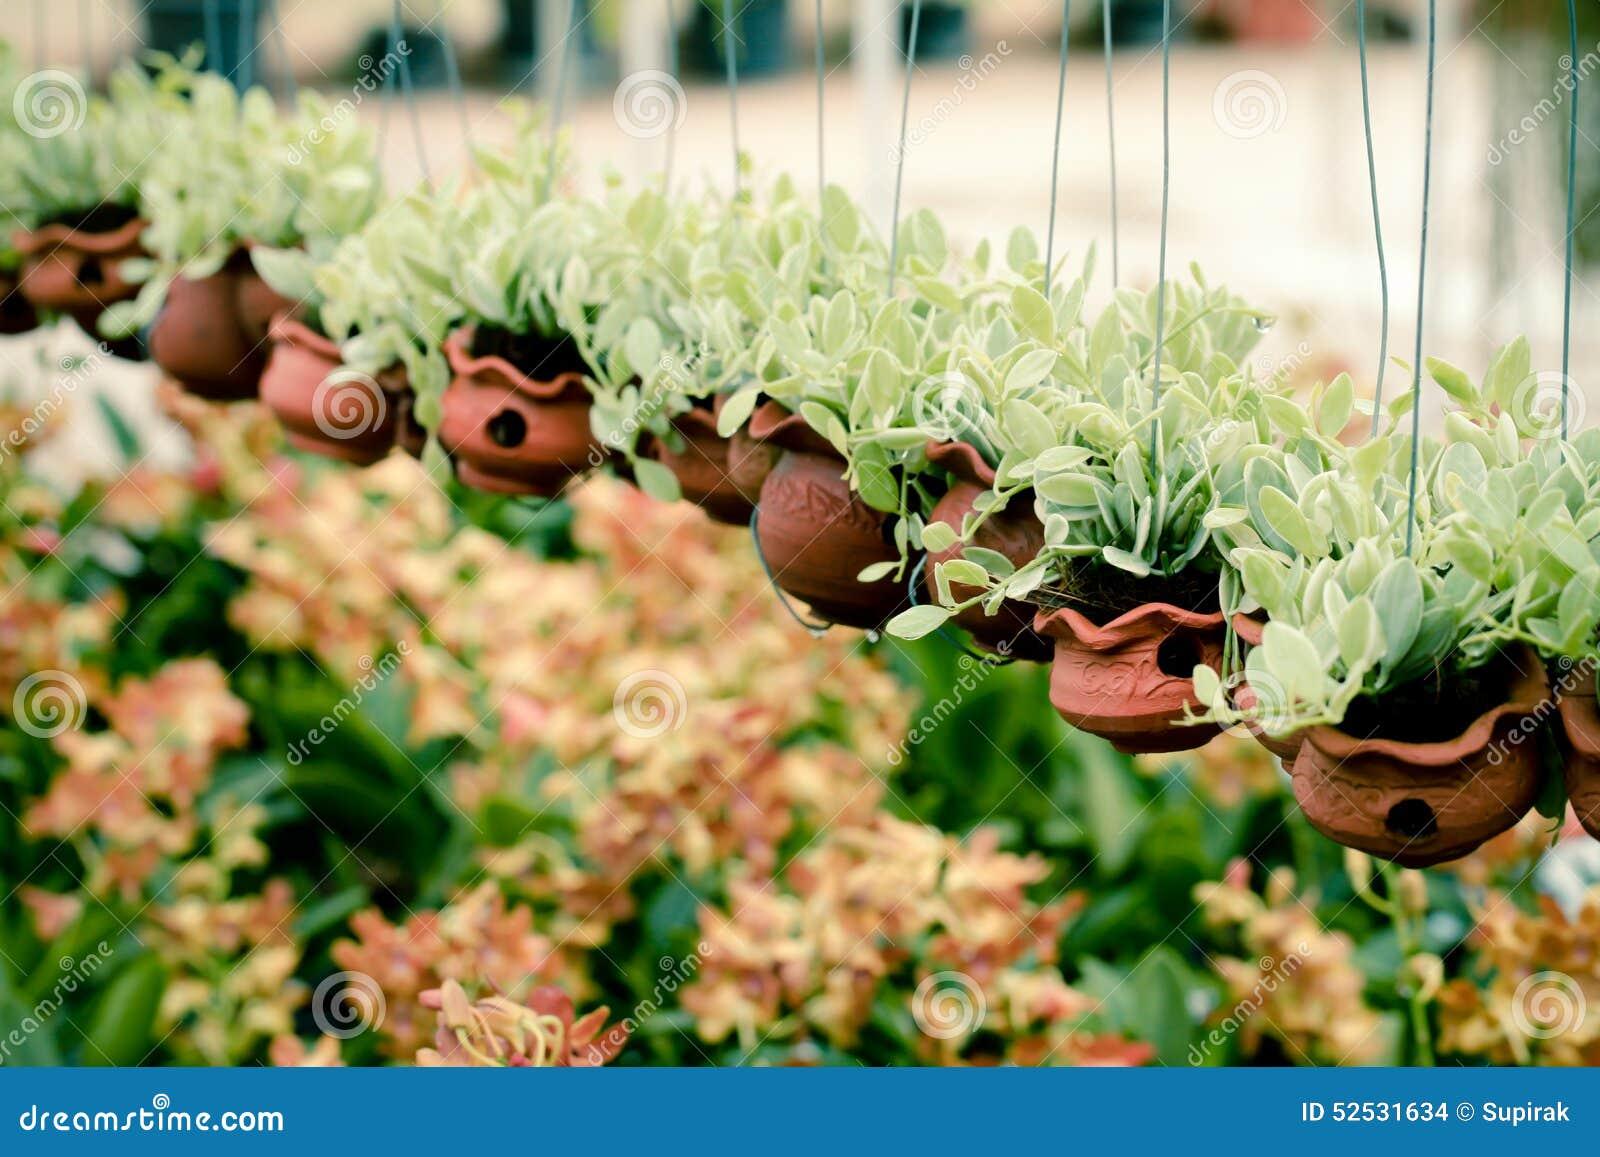 Planting Orchids Choosing Clay Vs Plastic Pots You